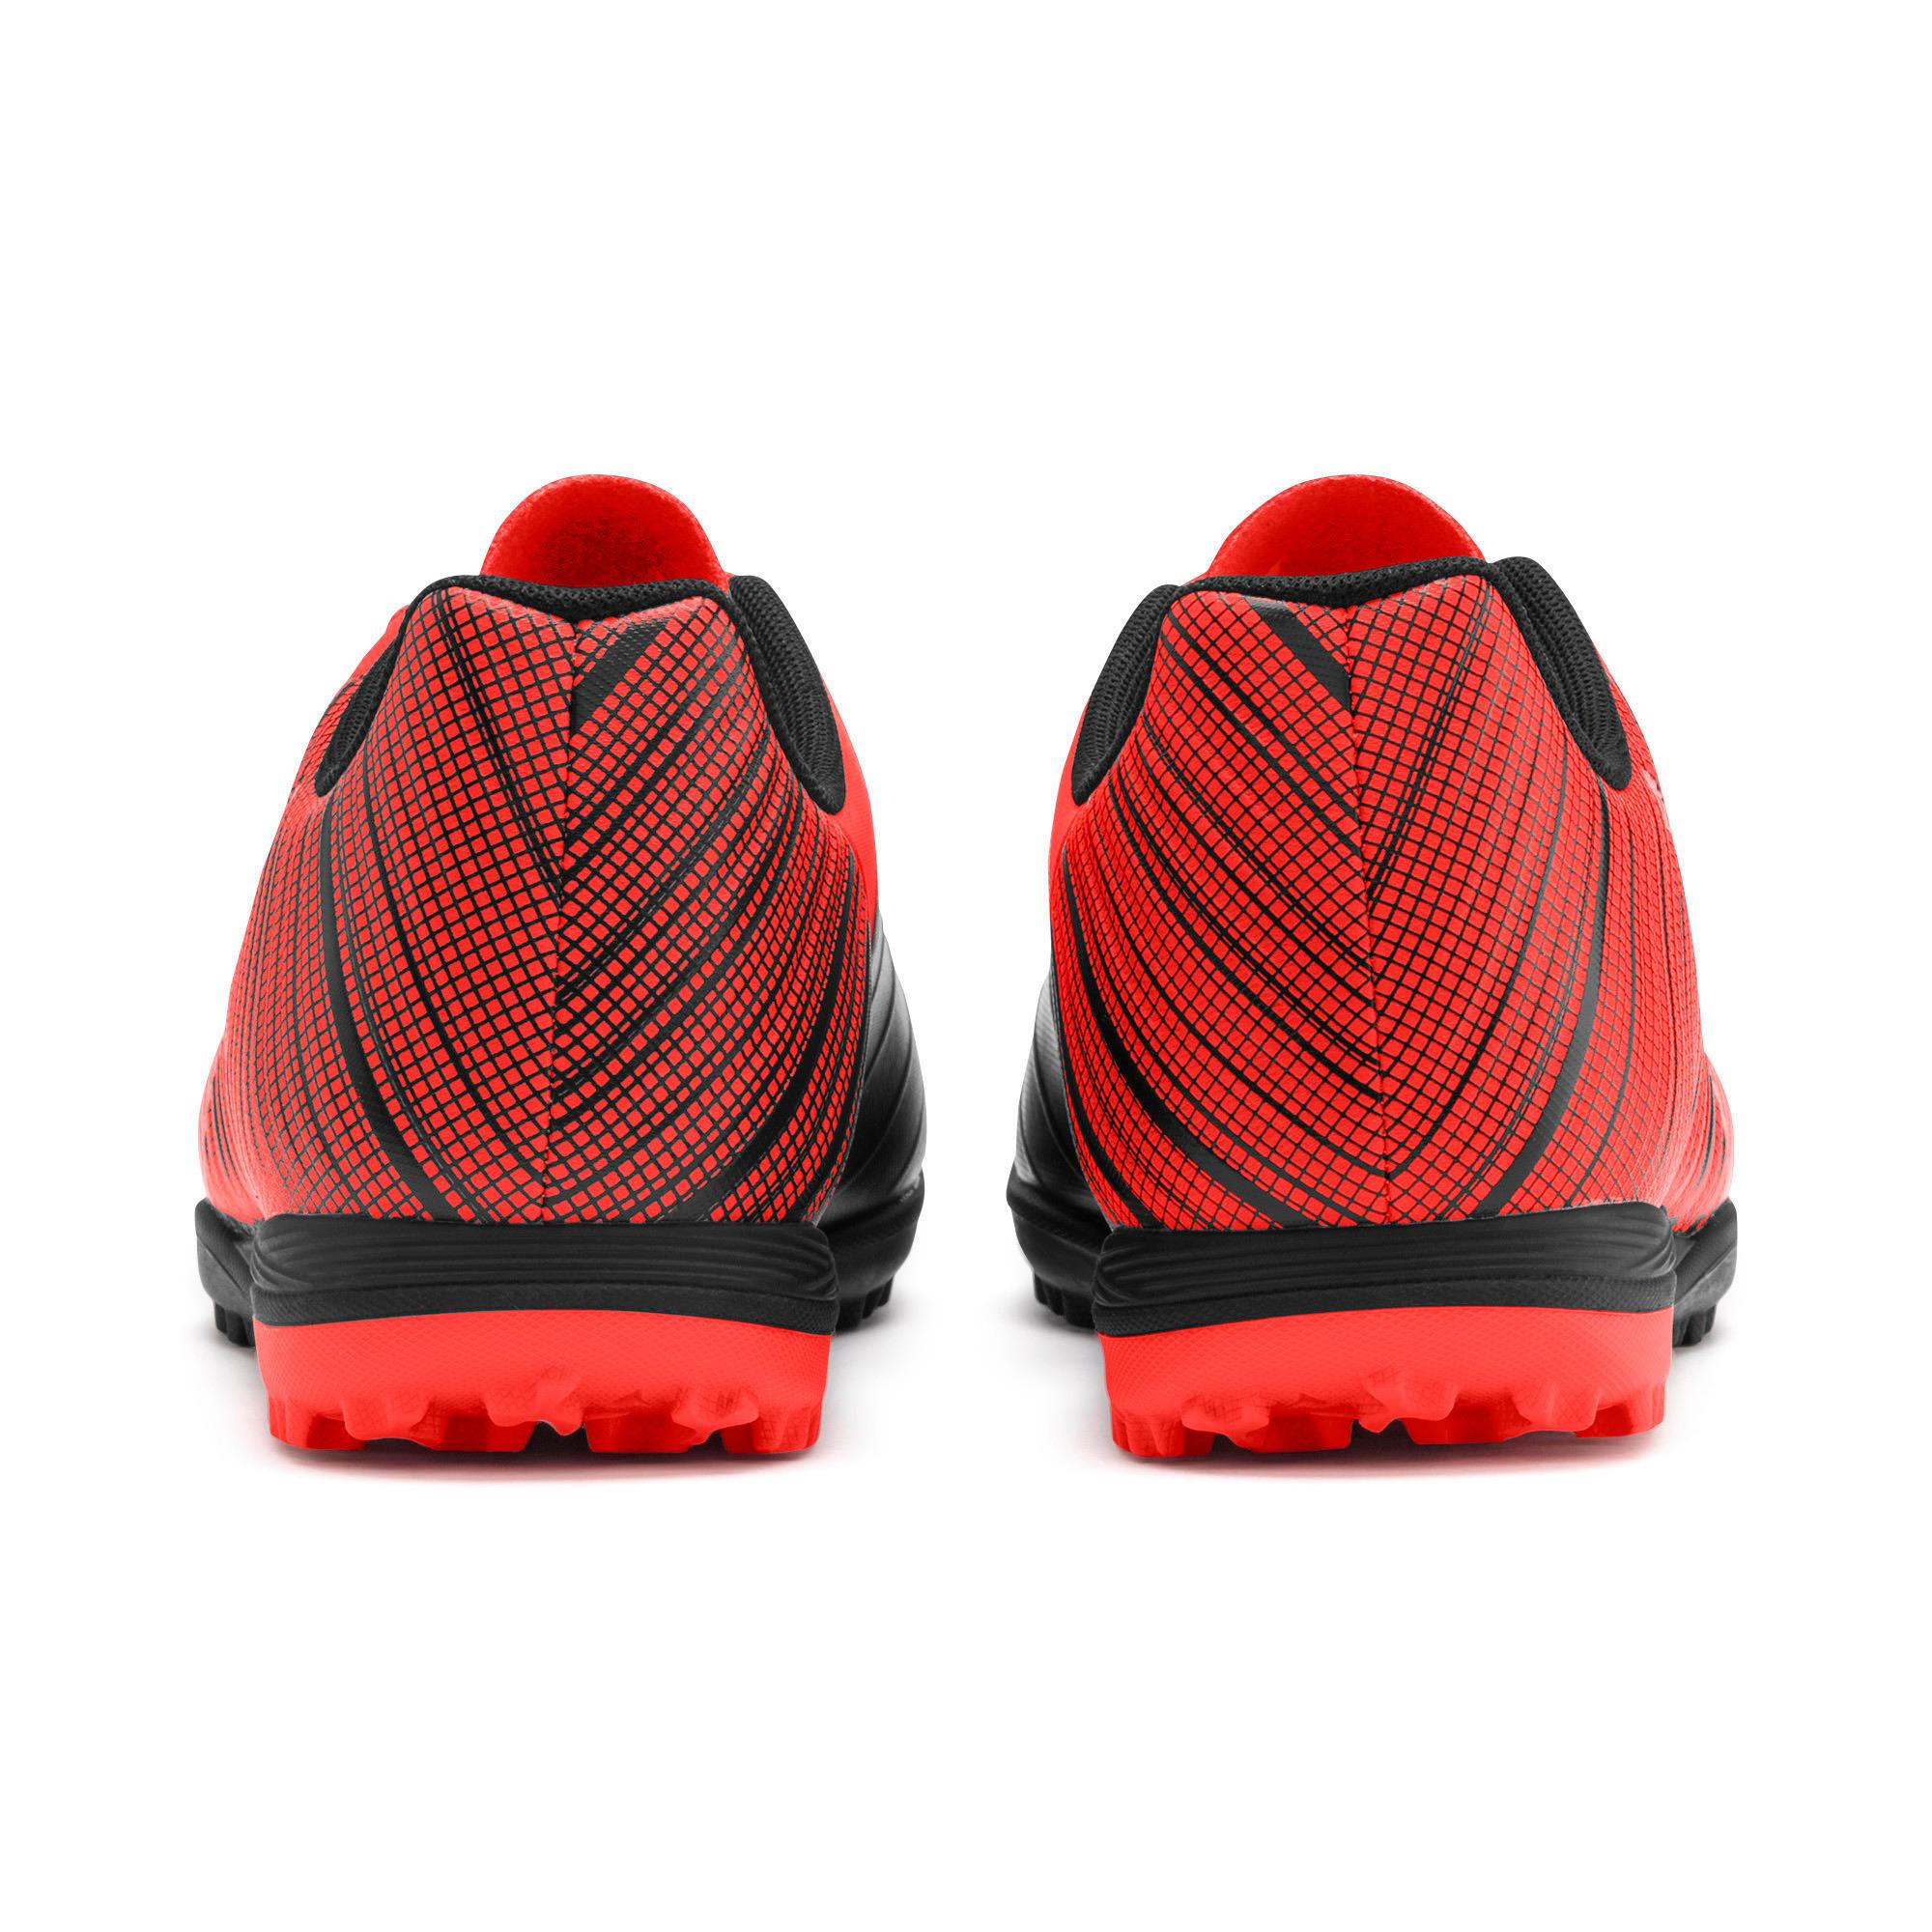 Thumbnail 4 of PUMA ONE 5.4 TT Men's Football Boots, Black-Nrgy Red-Aged Silver, medium